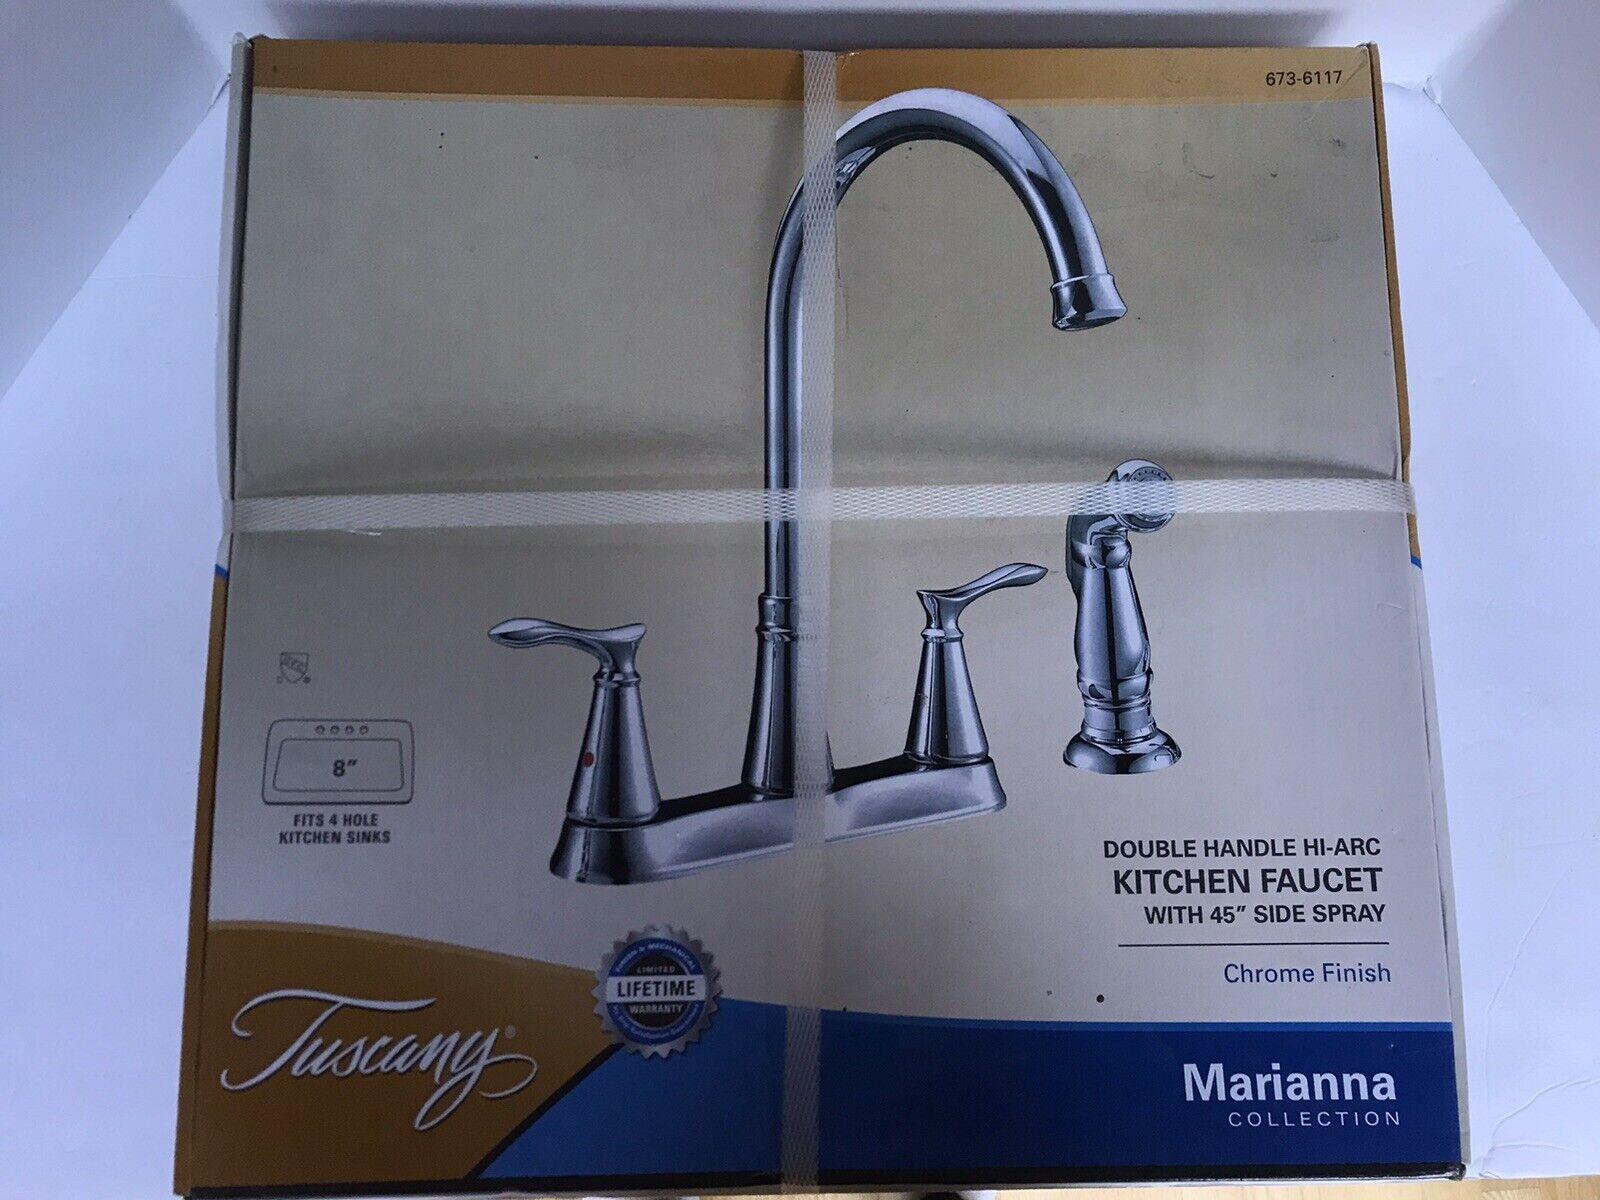 Moen 87986cpr Hi Arc Two Handle Copper Kitchen Faucet W Spray Nos For Sale Online Ebay